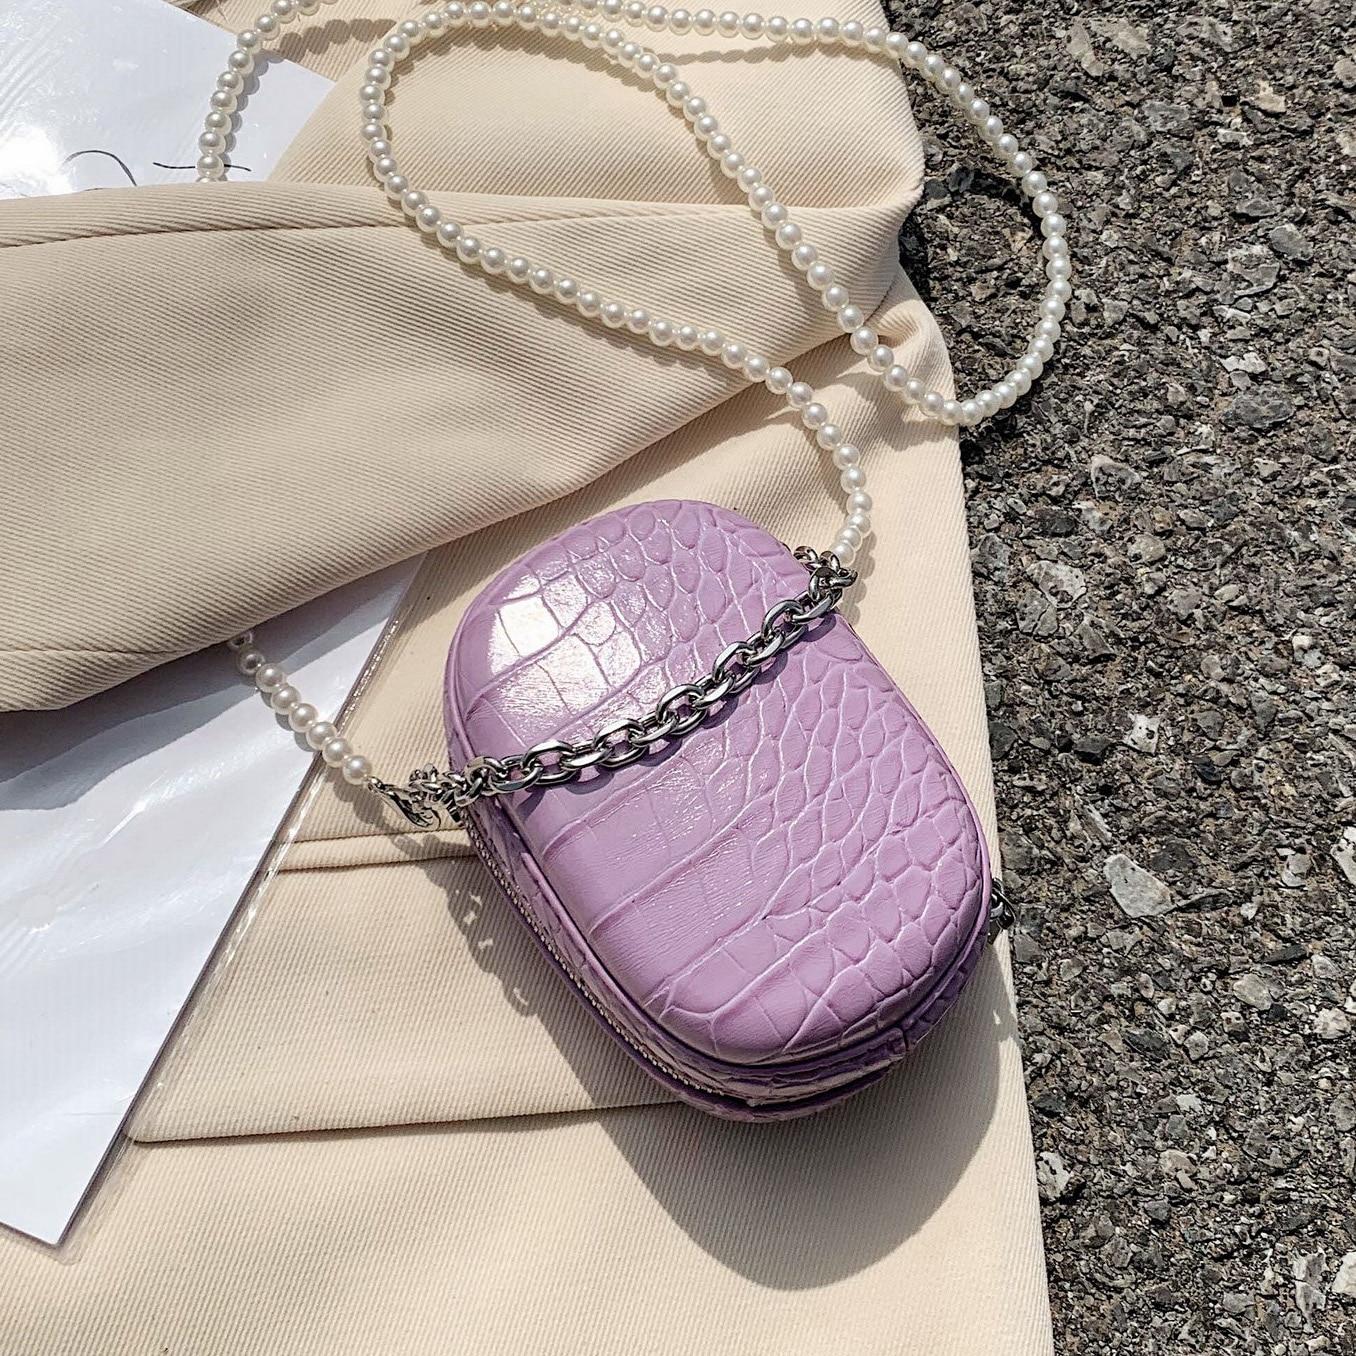 Mini Box Design Crocodile Pattern PU Leather Crossbody Bags For Women 2020 Summer Shoulder Handbags With Pearl Shoulder Belt